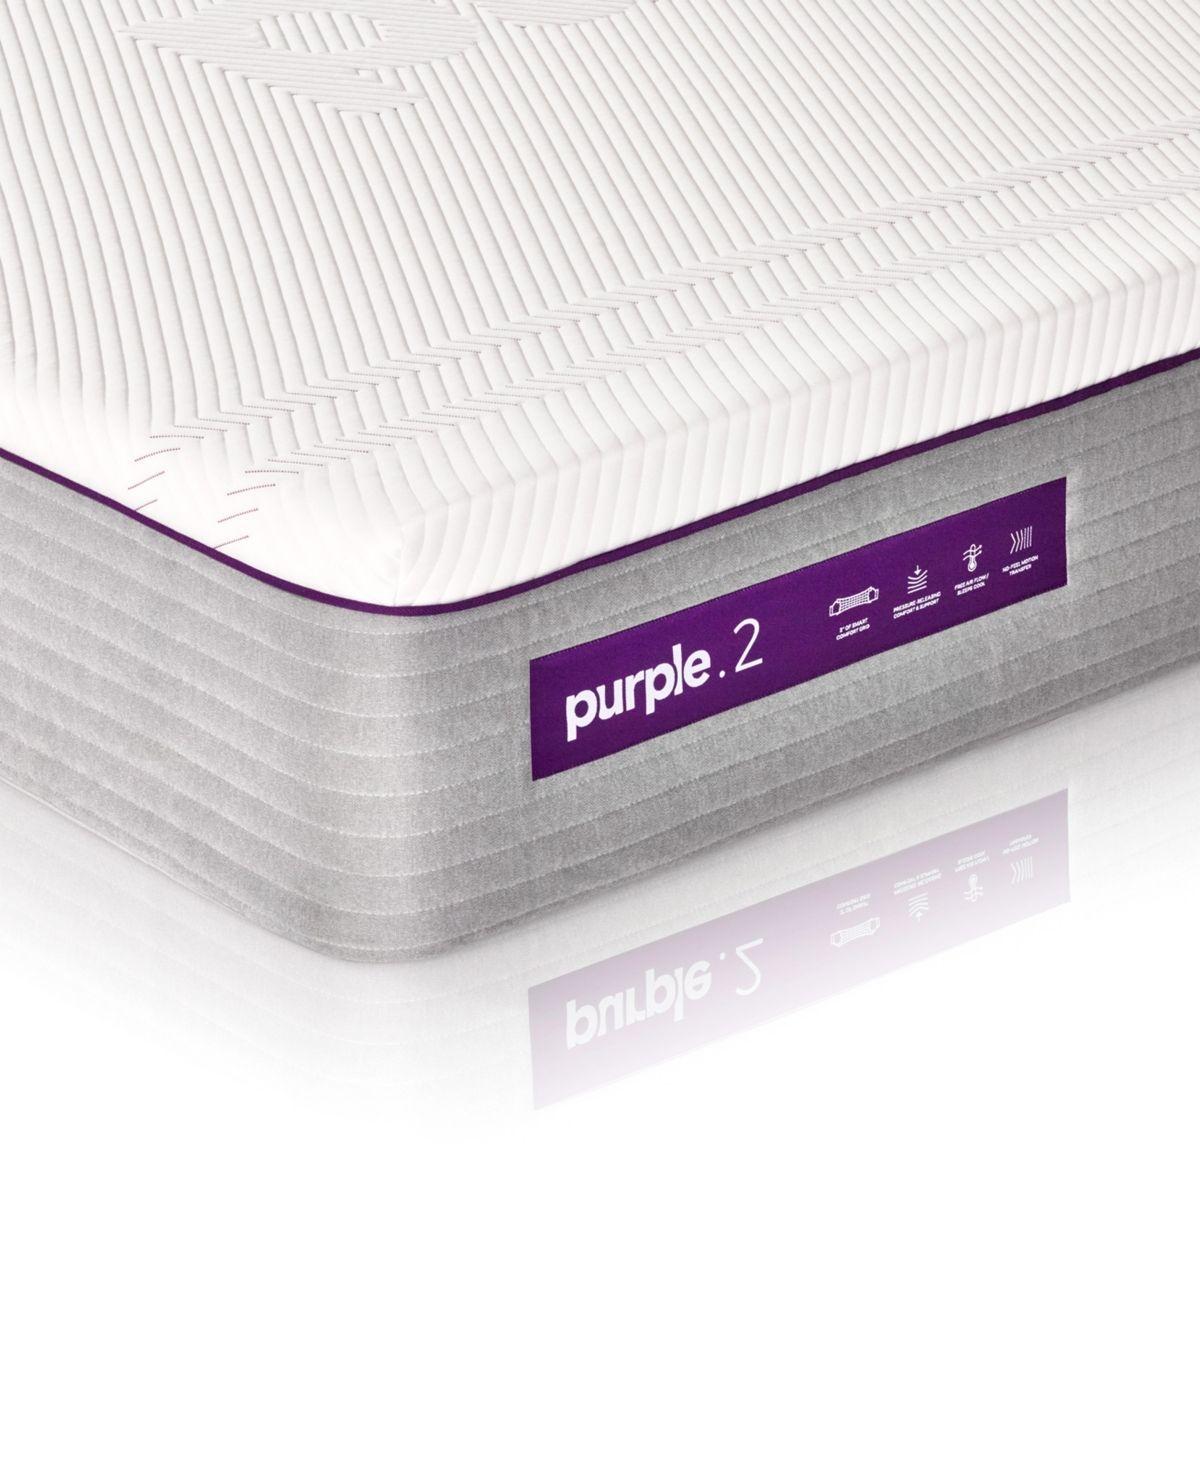 Purple 2 Hybrid 11 Mattress Full Reviews Mattresses Macy S In 2020 With Images Purple Mattress Firm Mattress Purple